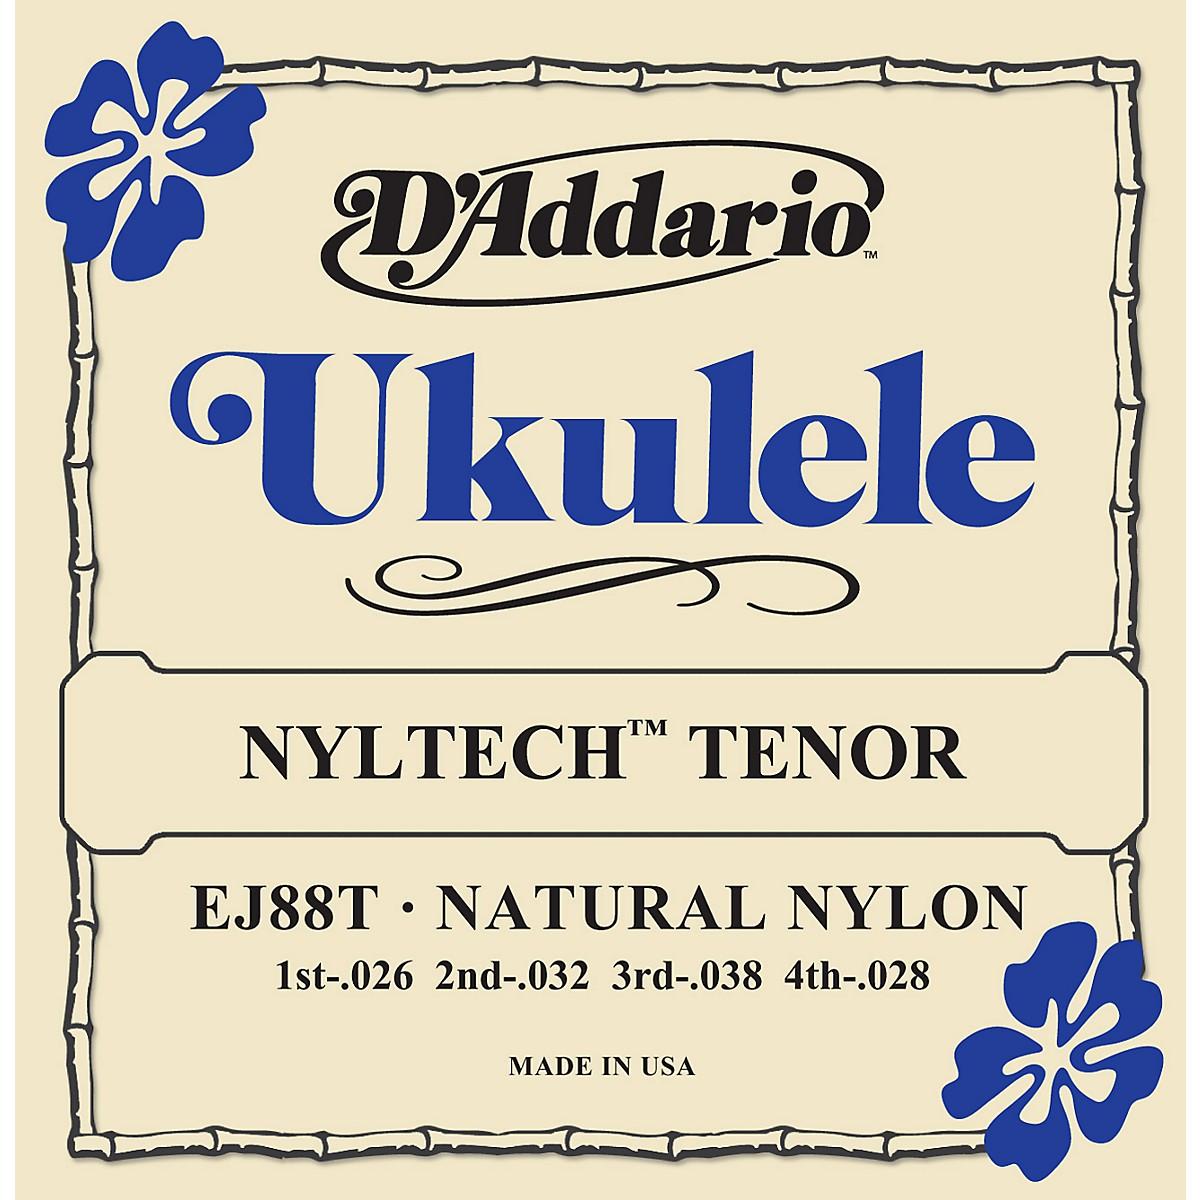 D'Addario EJ88T Nyltech Tenor Ukulele Strings